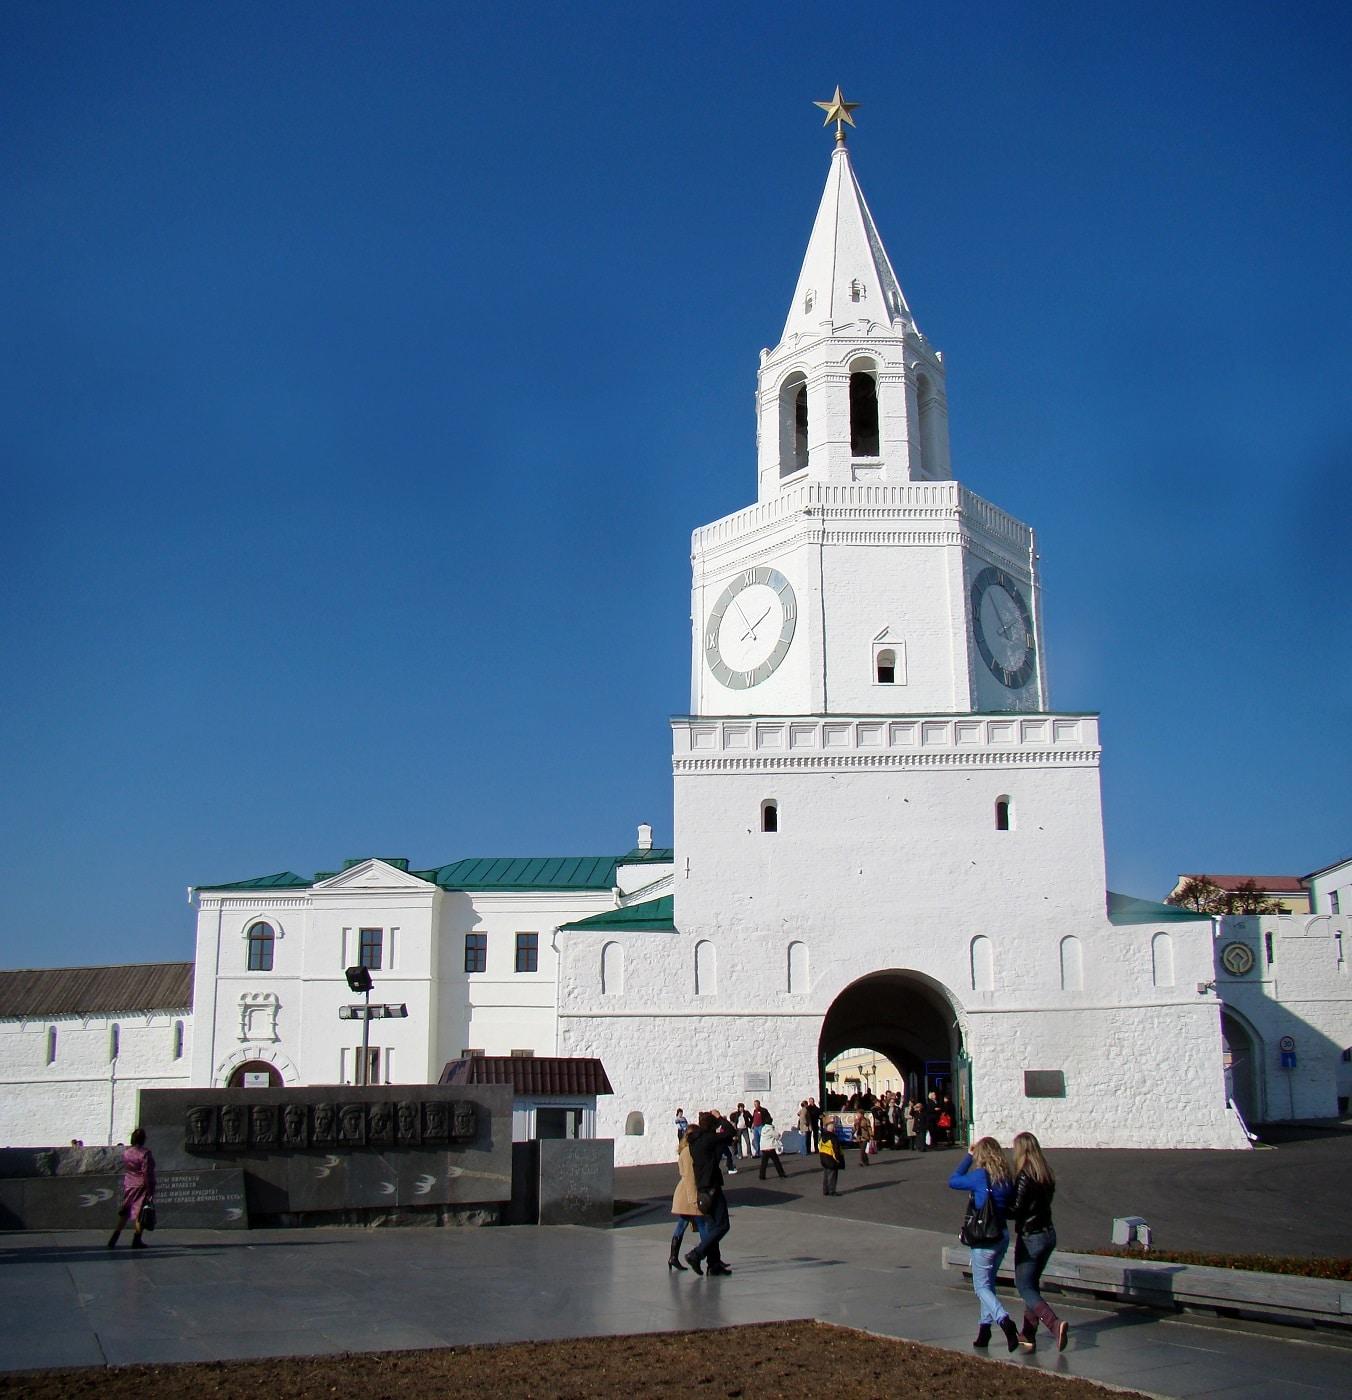 Turnul Spasskaya, Kremlin